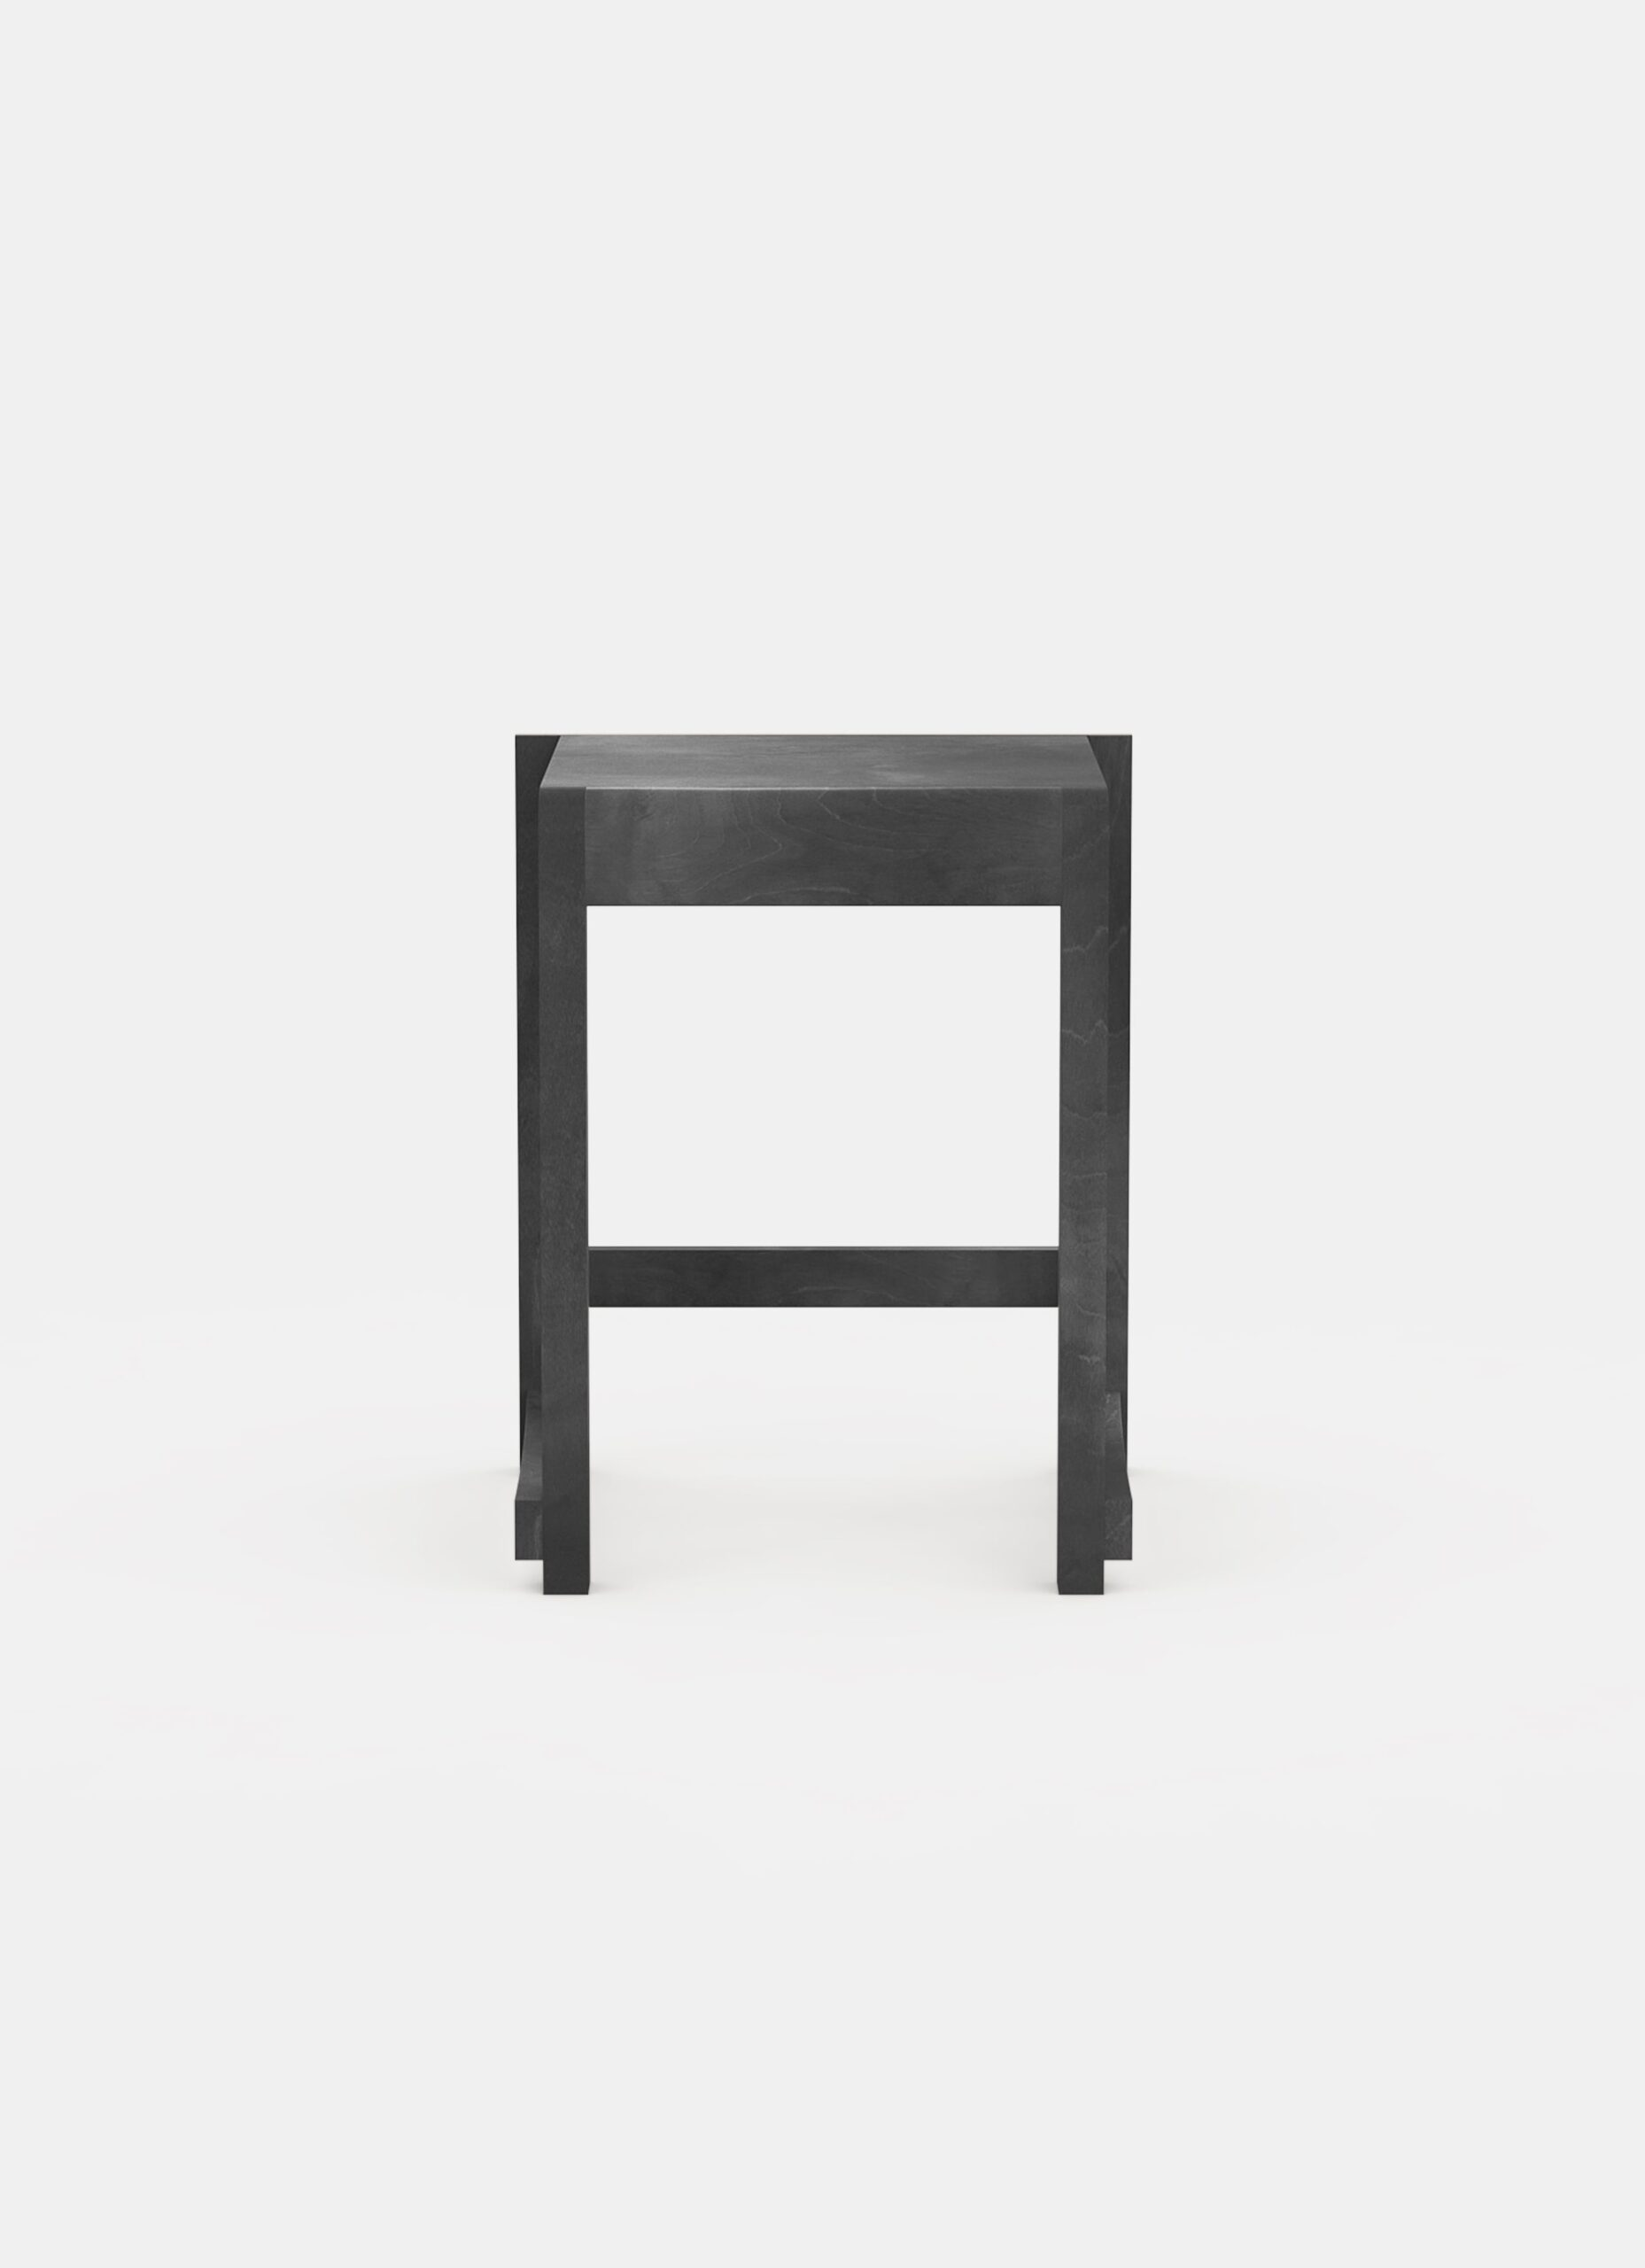 Frama - Low Stool 01 - Ash Black Wood